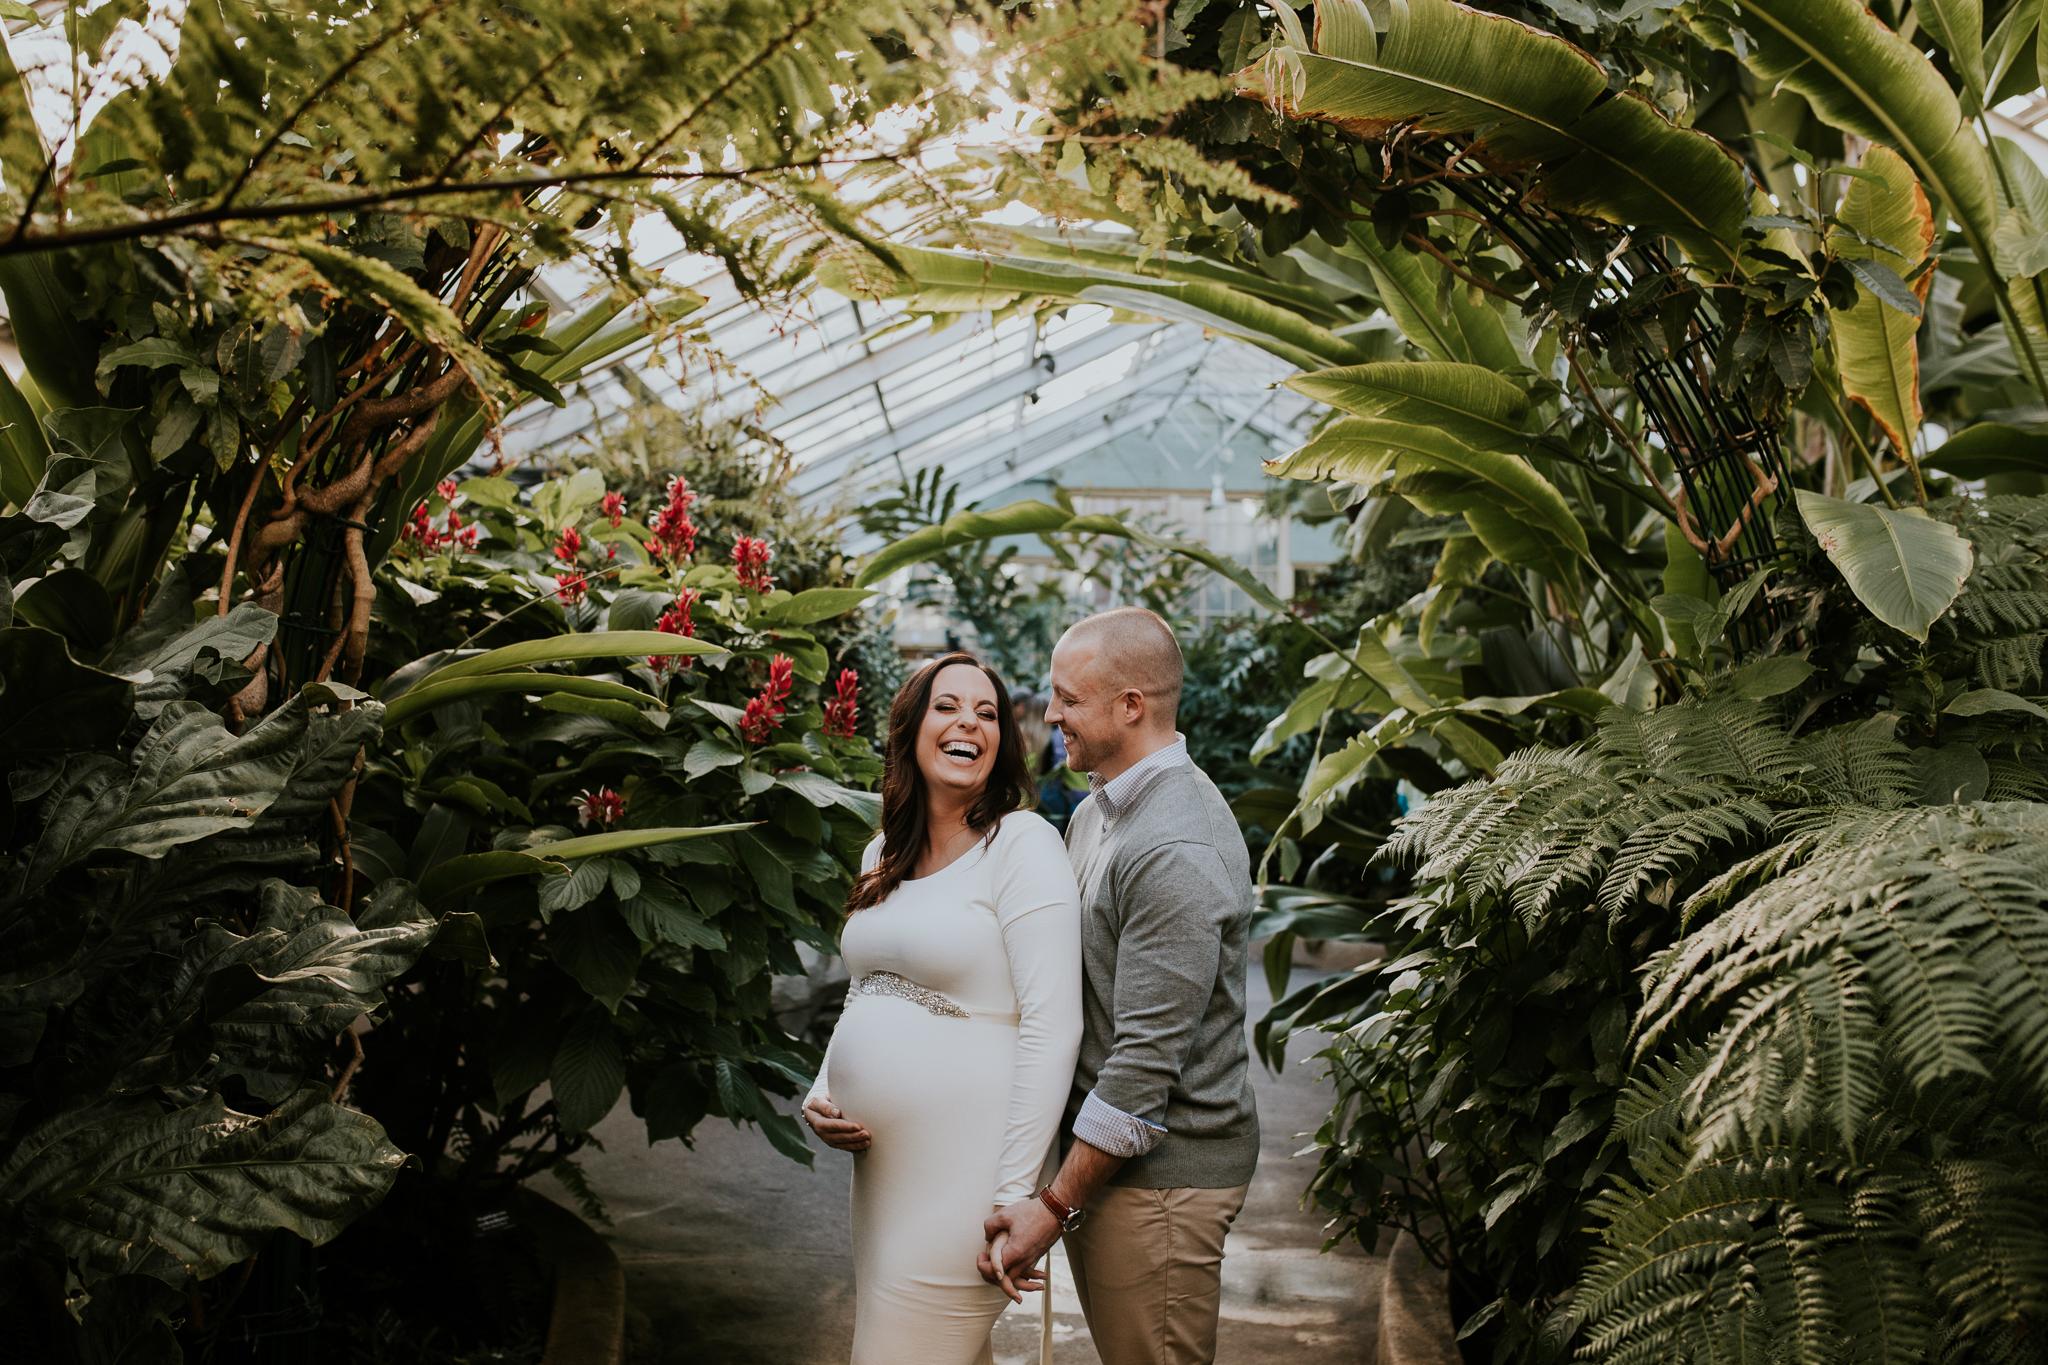 rawlings-conservatory-baltimore-maryland-+maternity-photographer-14.jpg